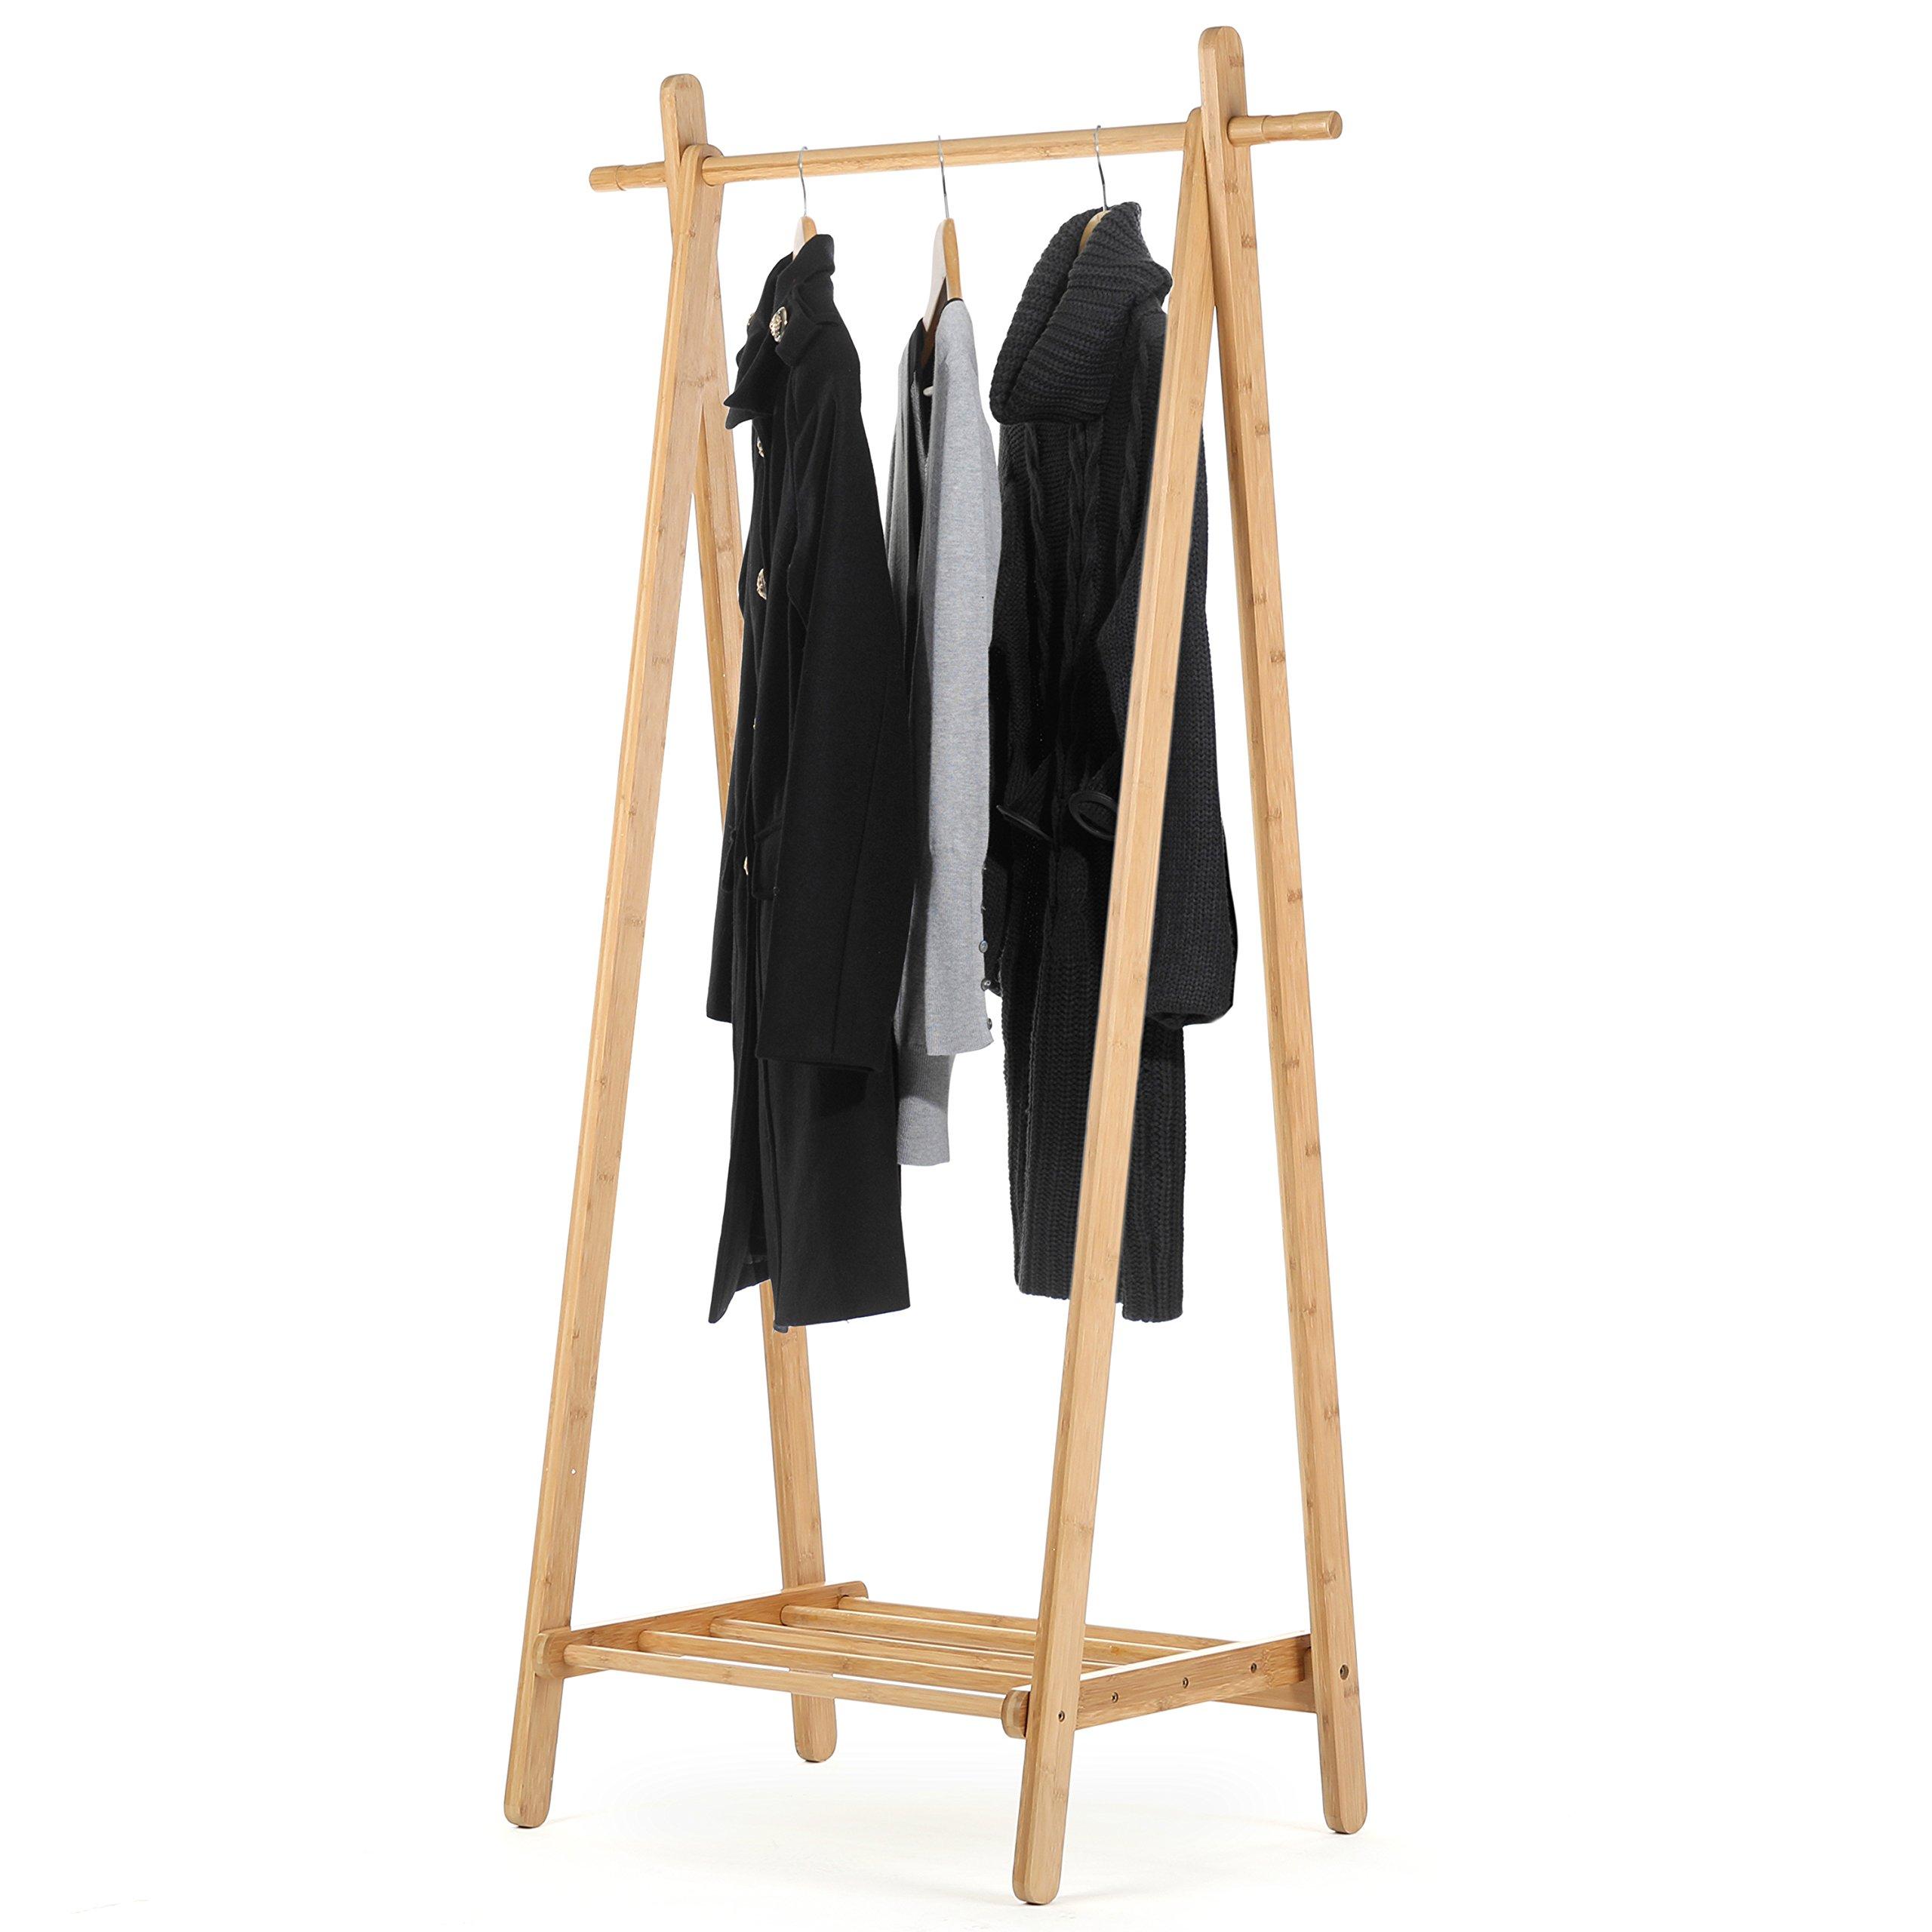 MyGift Entryway Wood Shoe and Coat Rack, Garment Storage Organizer Bar, Brown